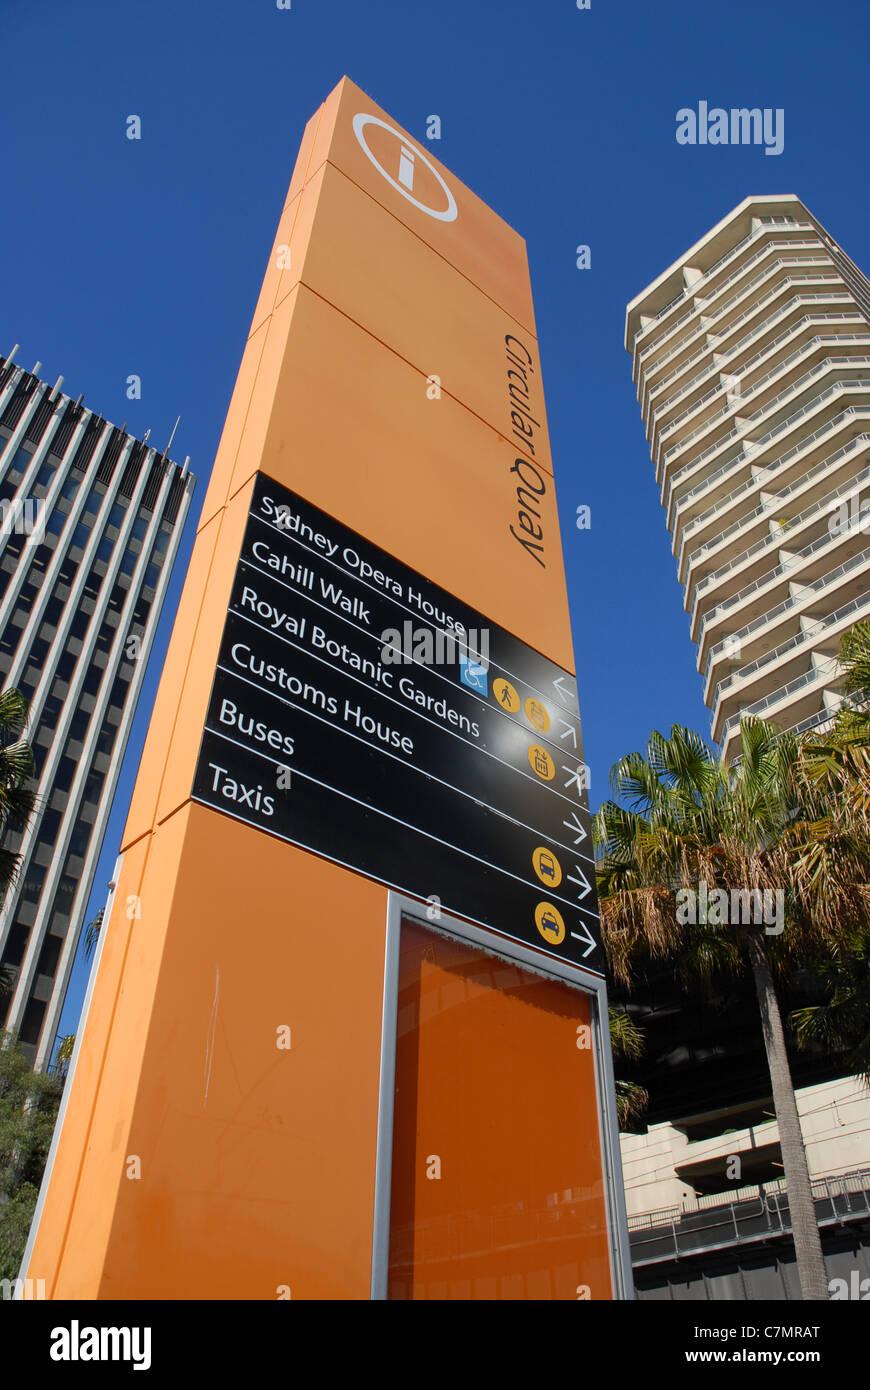 Information sign board, Circular Quay, Sydney, NSW, Australia - Stock Image